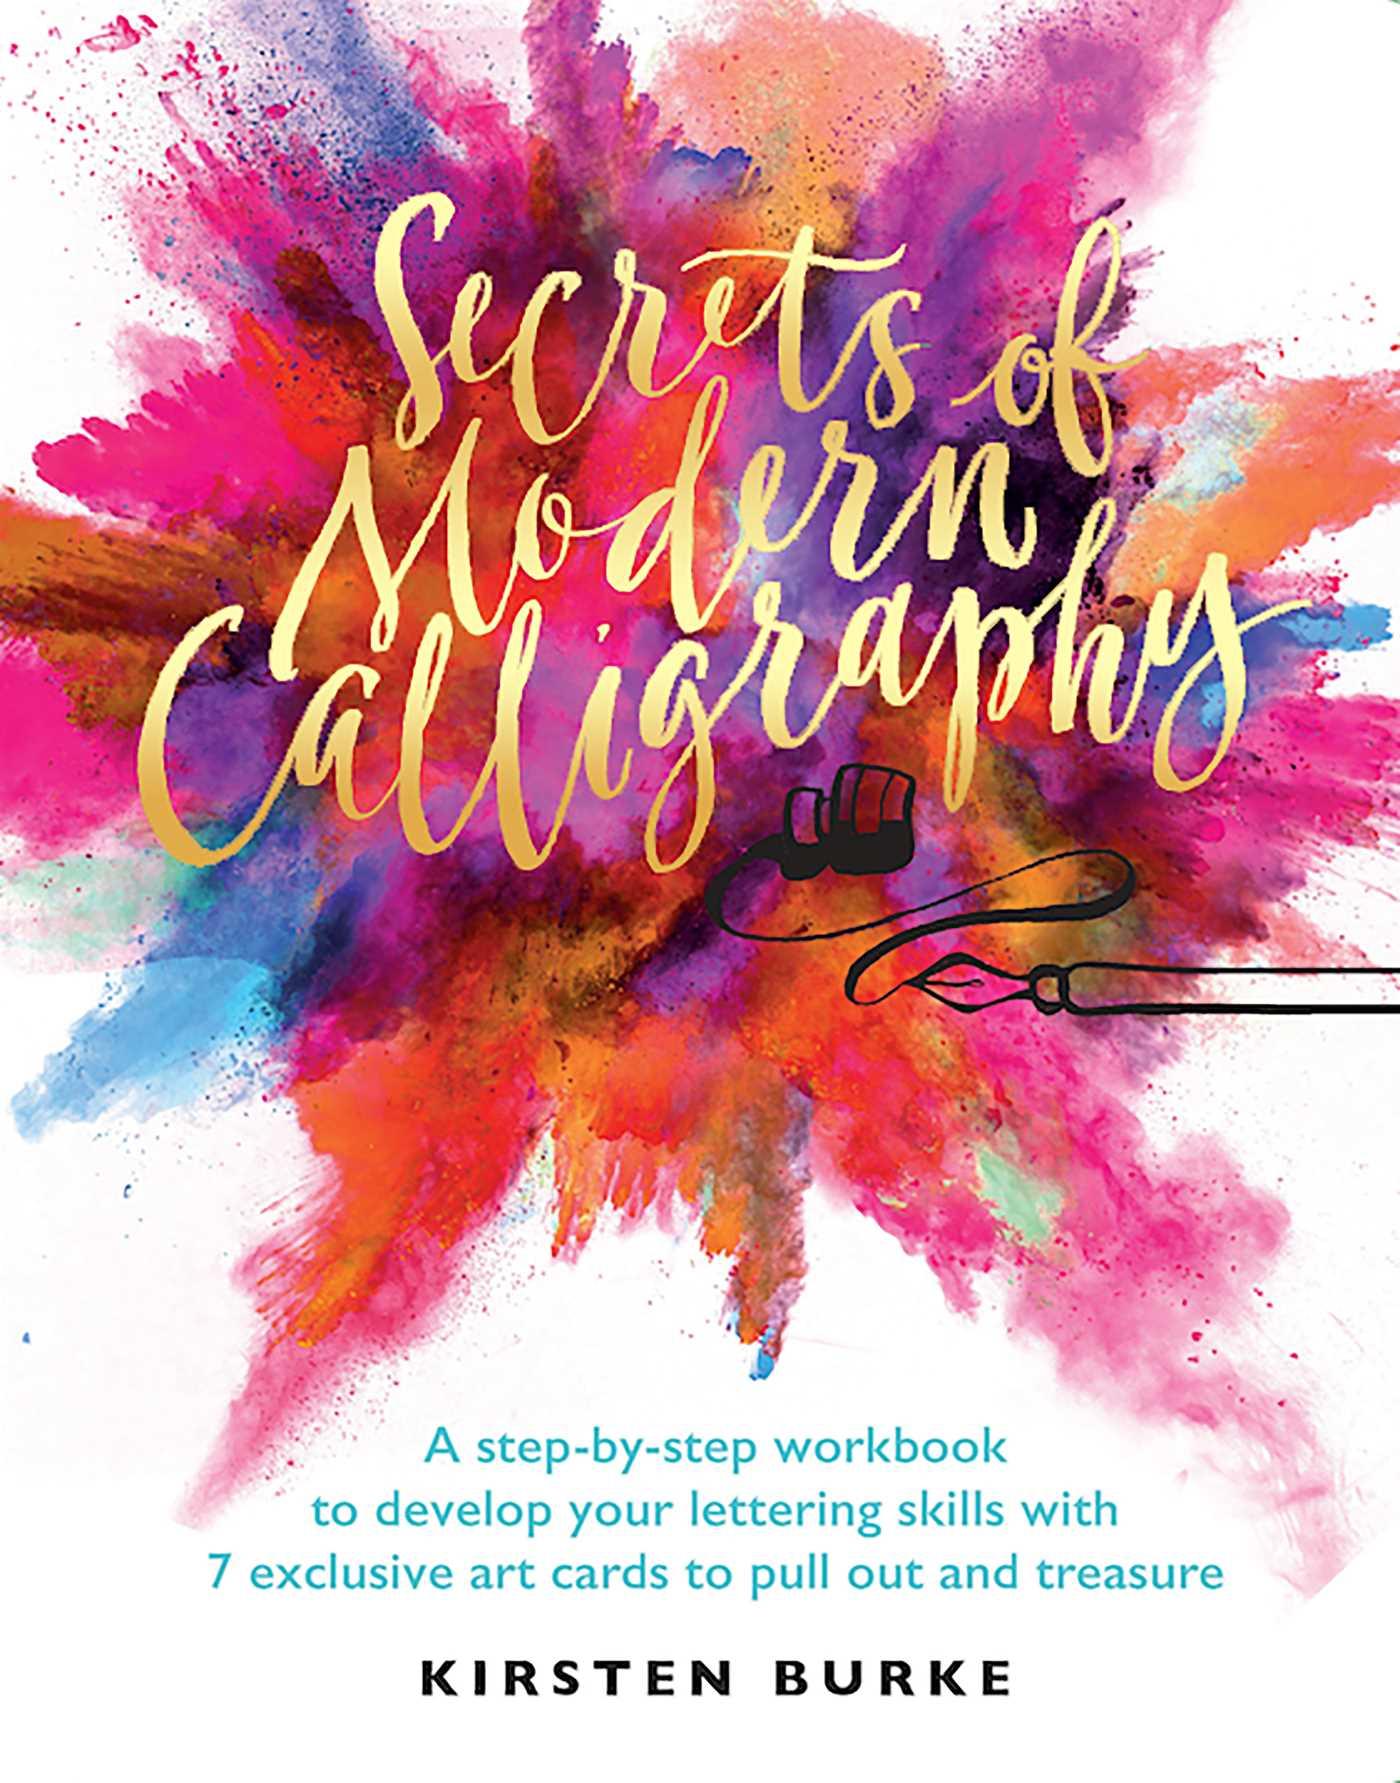 Secrets of modern calligraphy 9781681883823 hr